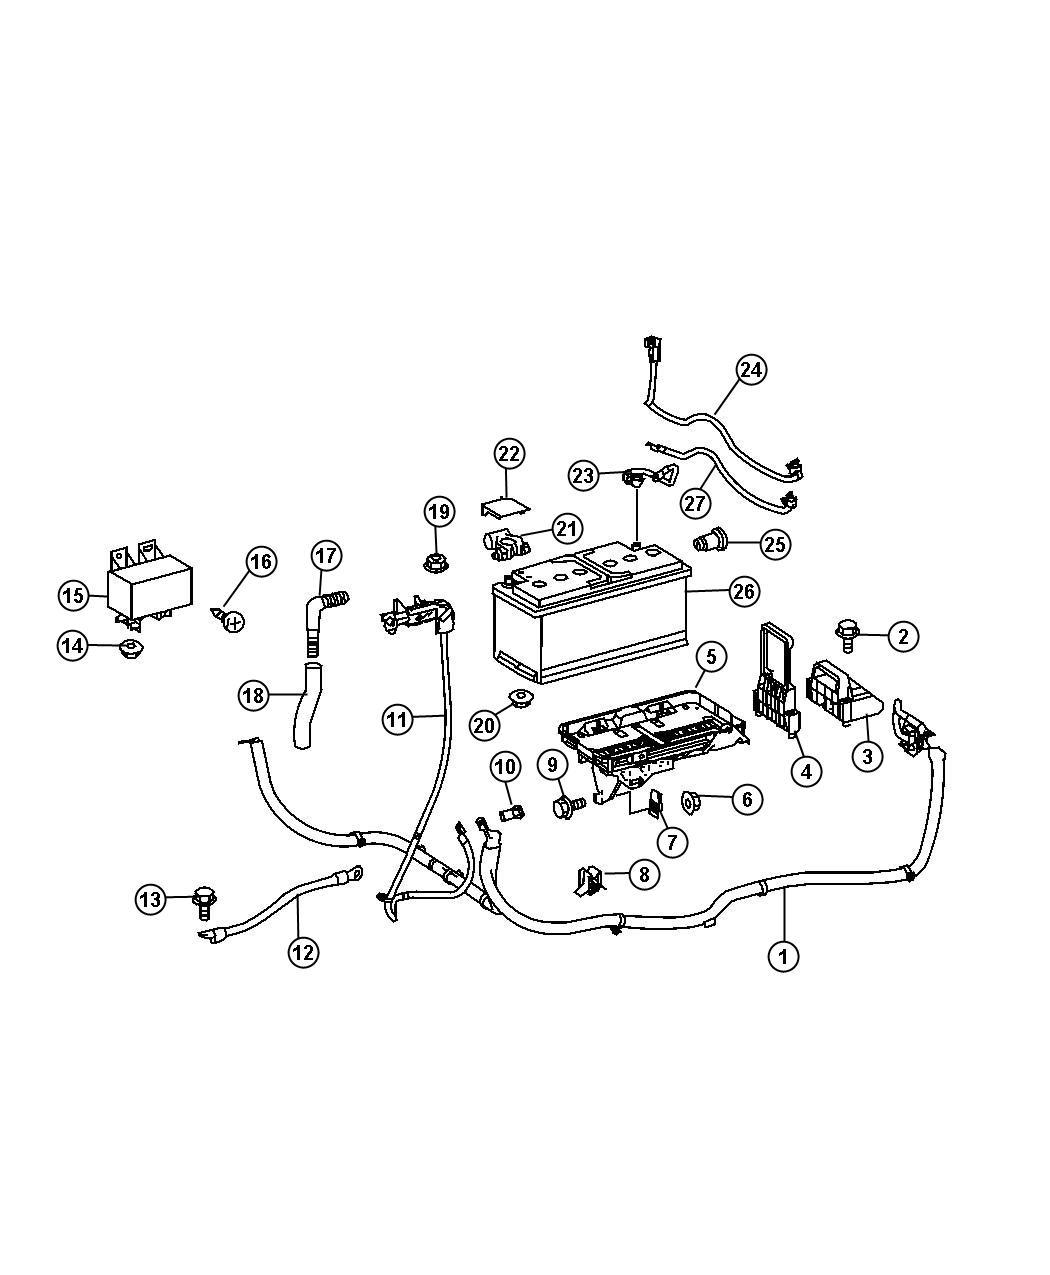 Dodge Sprinter Van 170 Wb Harness Wiring